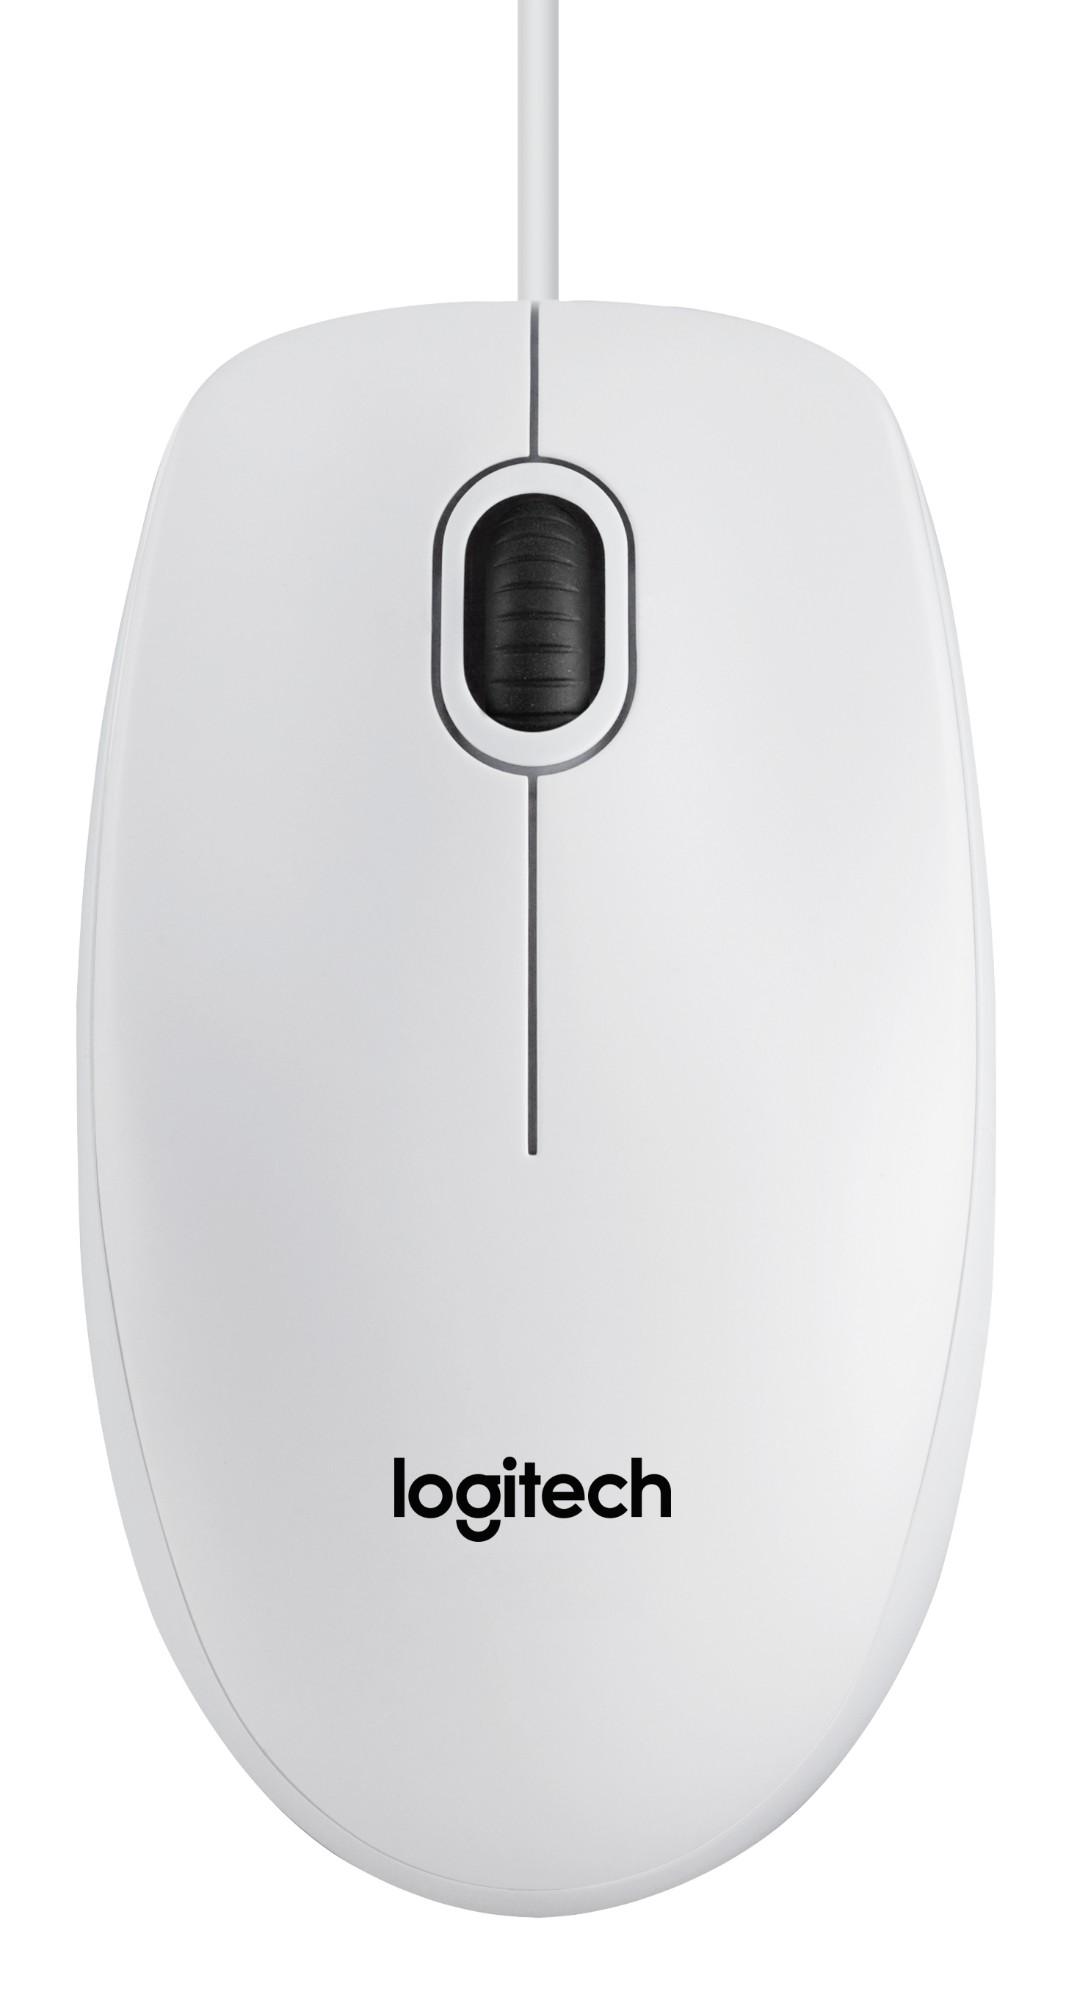 Logitech B100 ratón USB Óptico 800 DPI Ambidextro